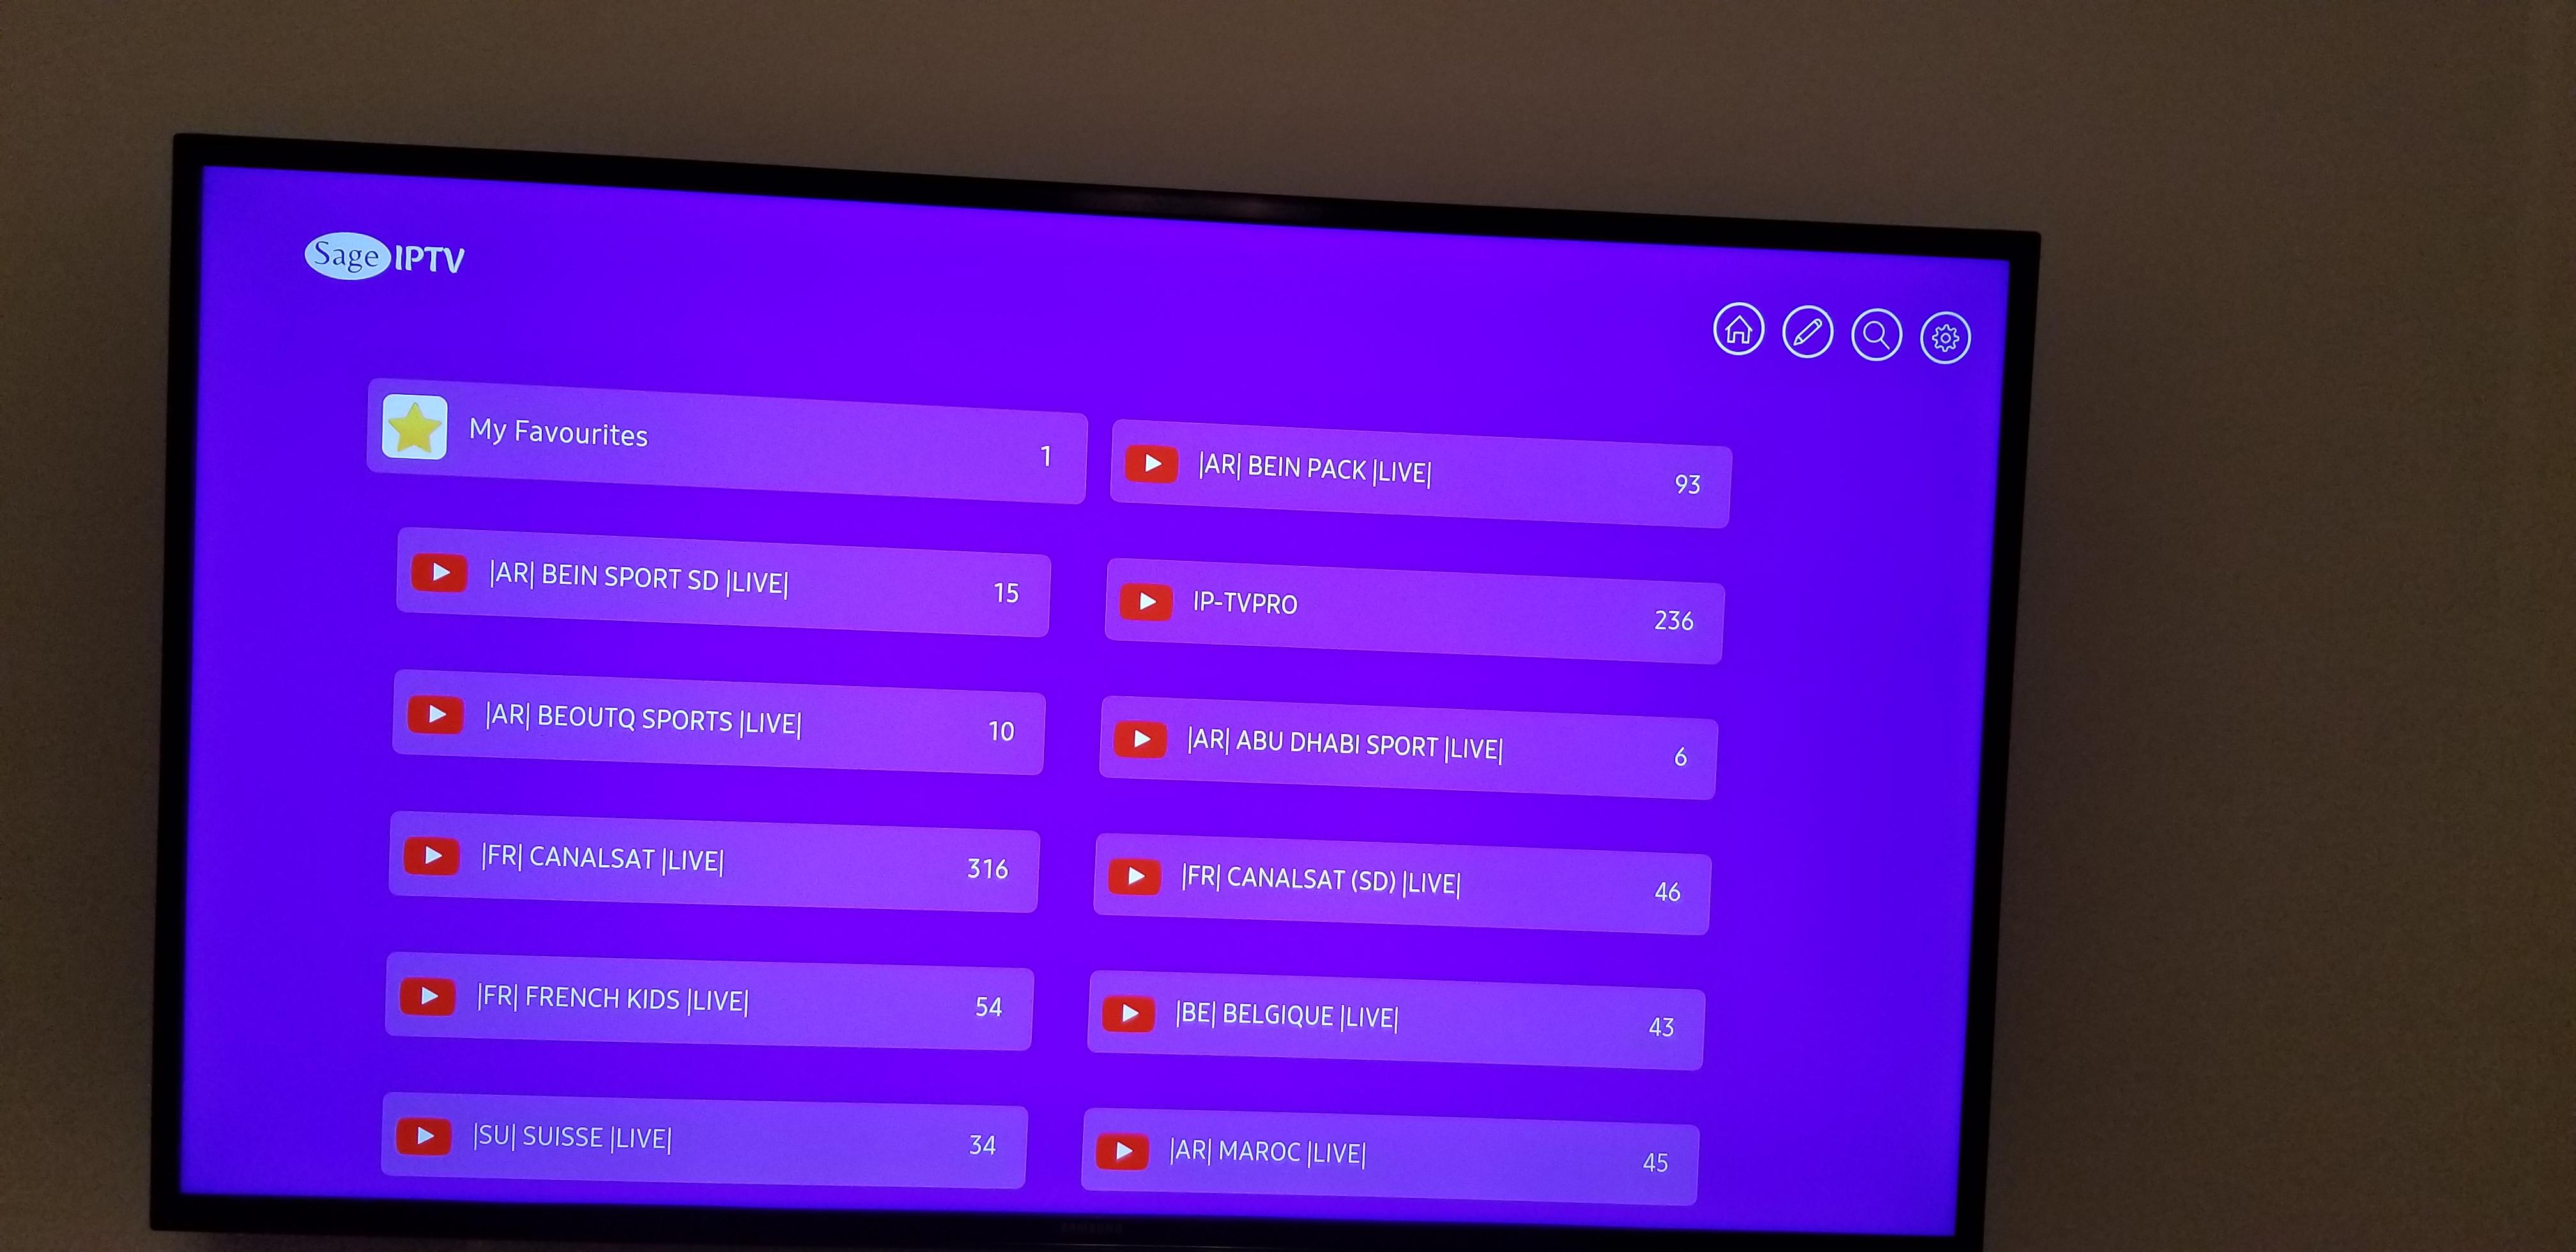 Samsung Smart TV | SageIPTV